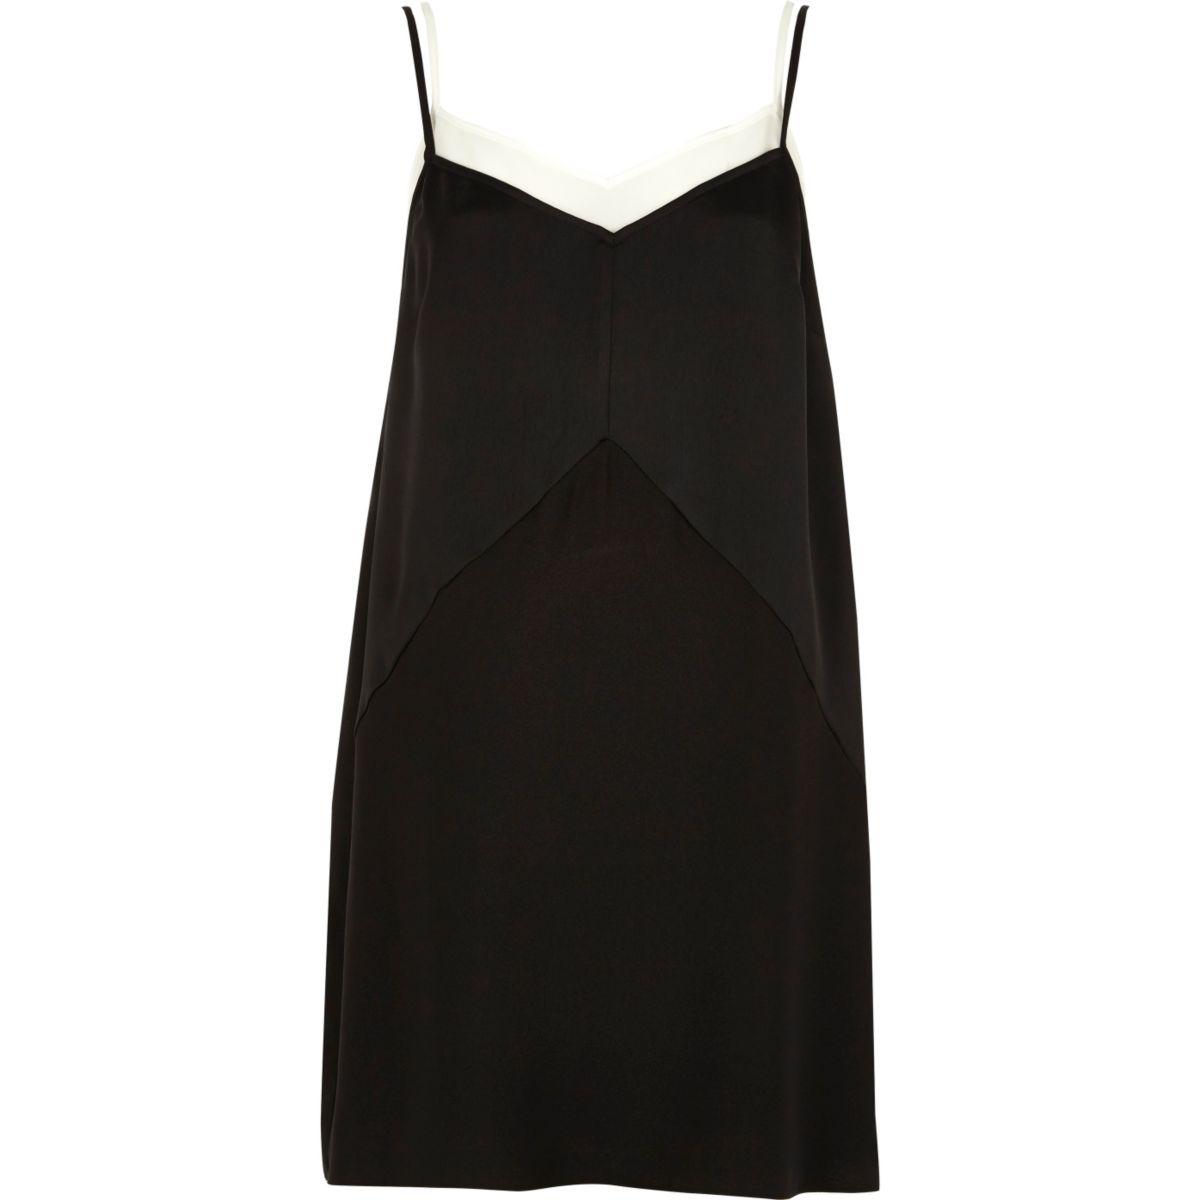 Black layered cami slip dress